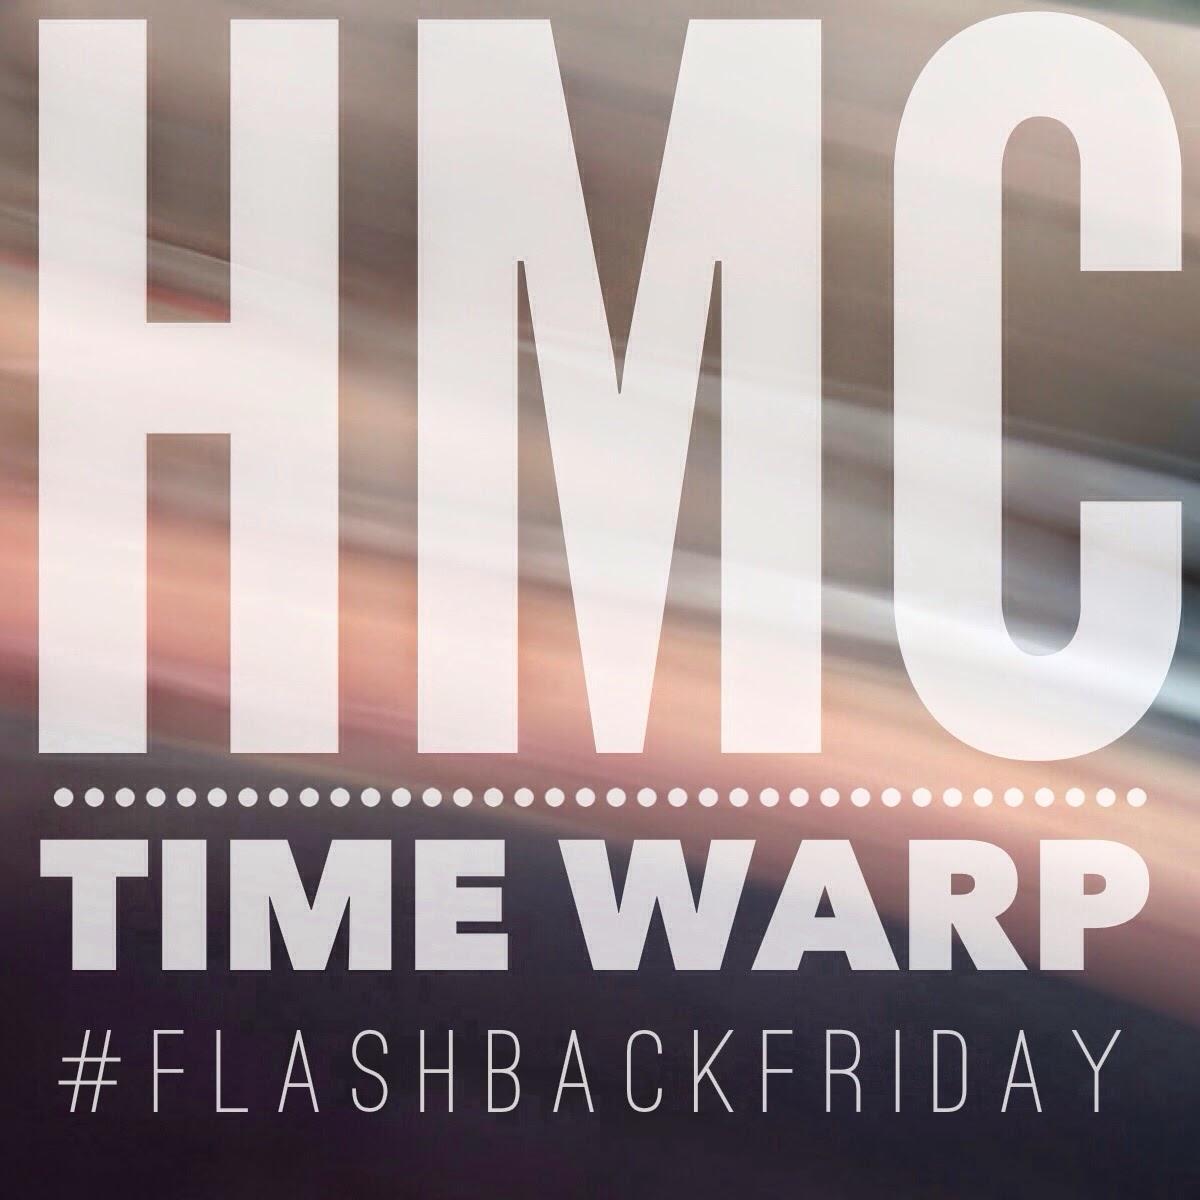 Flash Back Friday Hanover Missionary Church